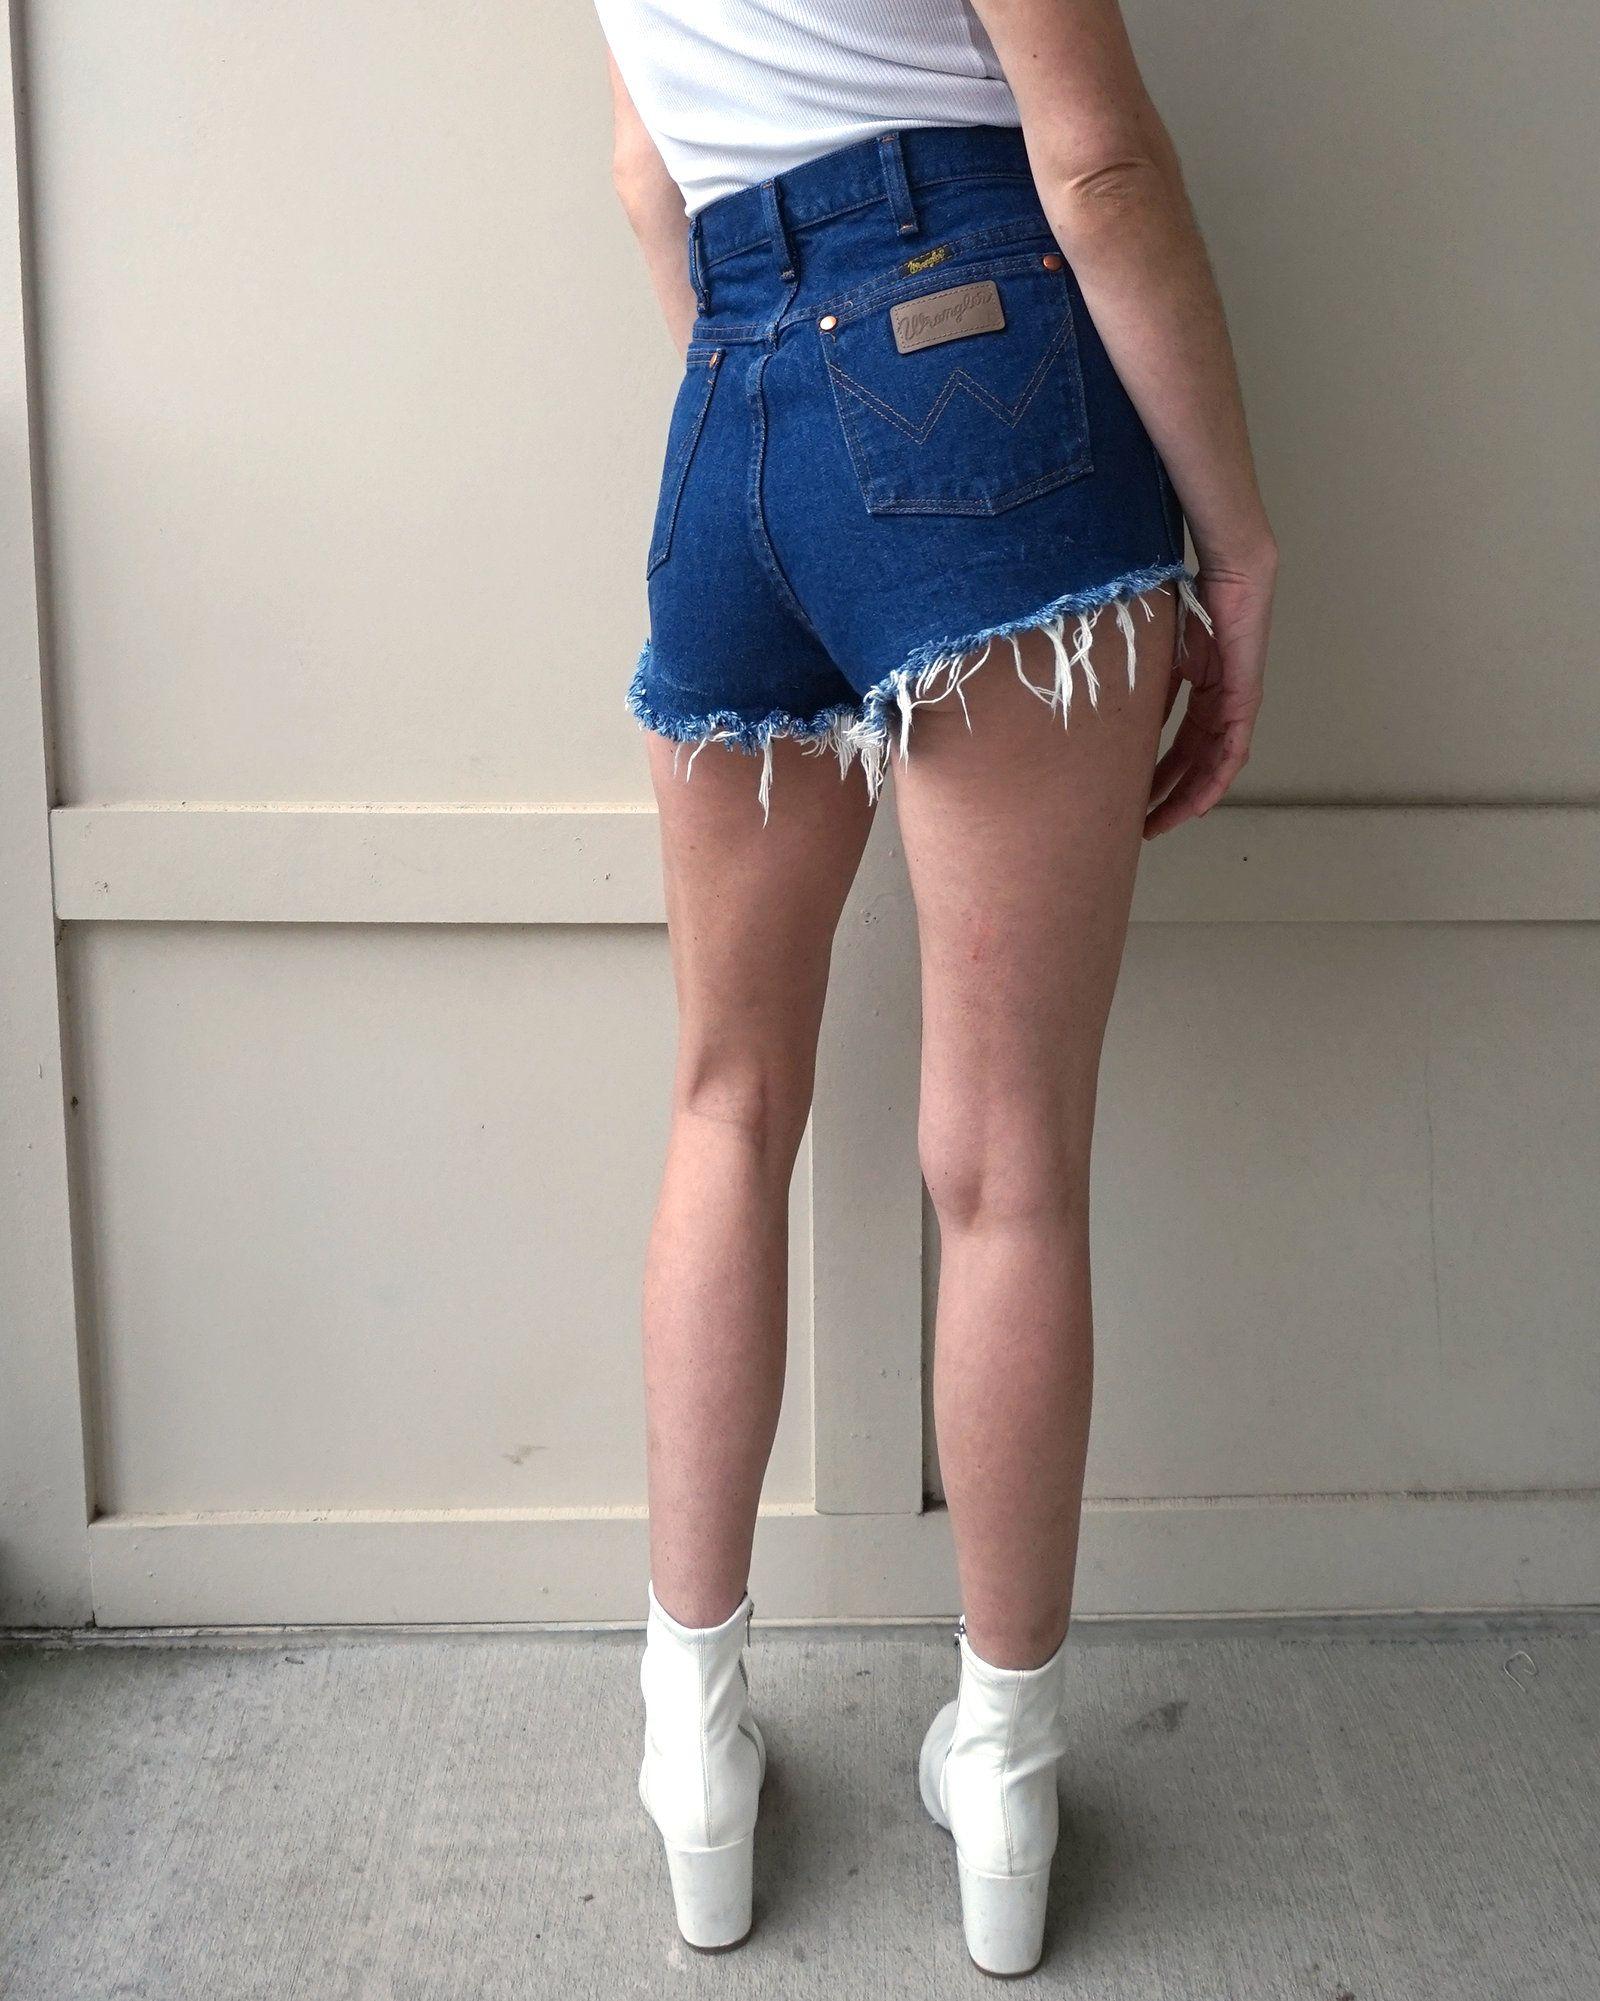 b35e138bde Cutoff Jean Shorts, Wrangler Jeans, Dark Denim, Cut Off, Skort, Overall